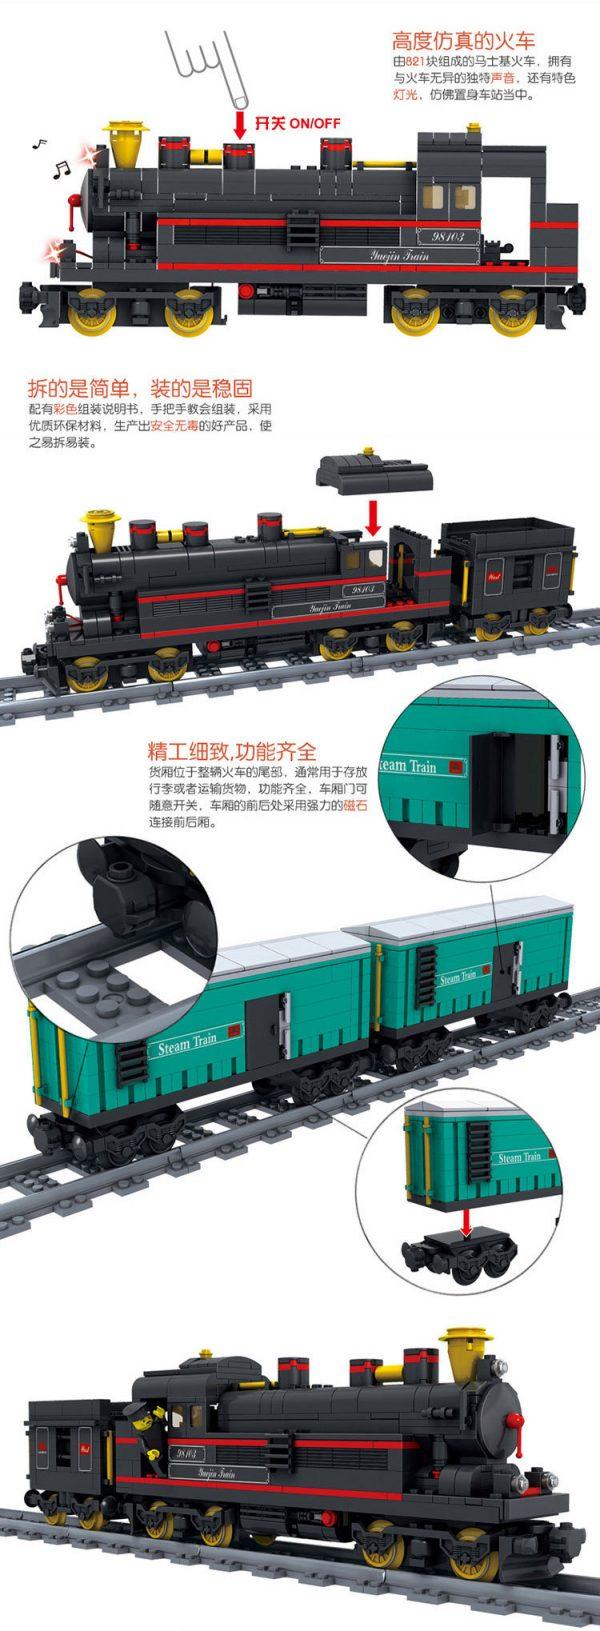 KAZI / GBL / BOZHI KY98226 Rail Train: Leap Forward 2